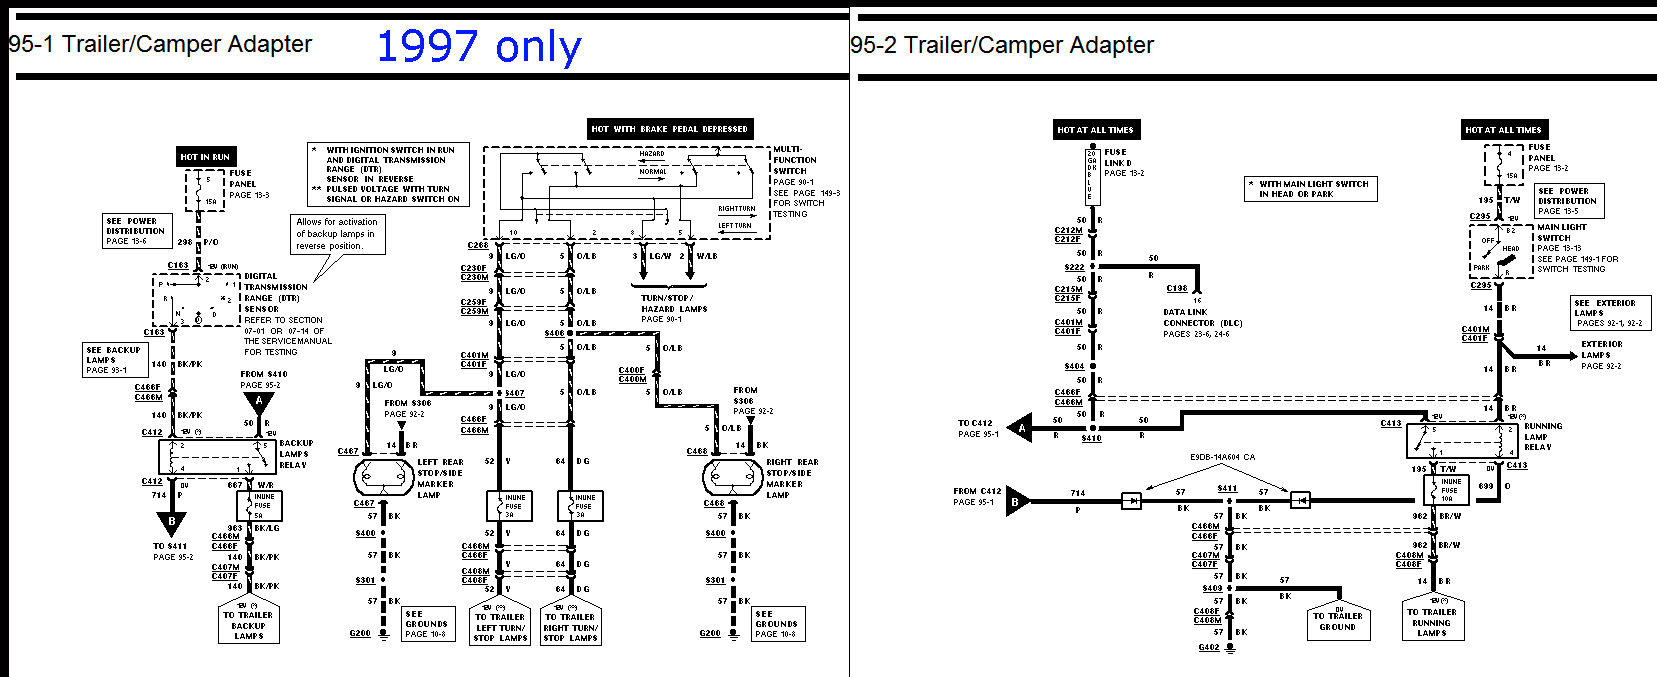 DF_5483] 1996 Ford F250 Wiring Diagram Wiring DiagramPapxe Xero Mohammedshrine Librar Wiring 101